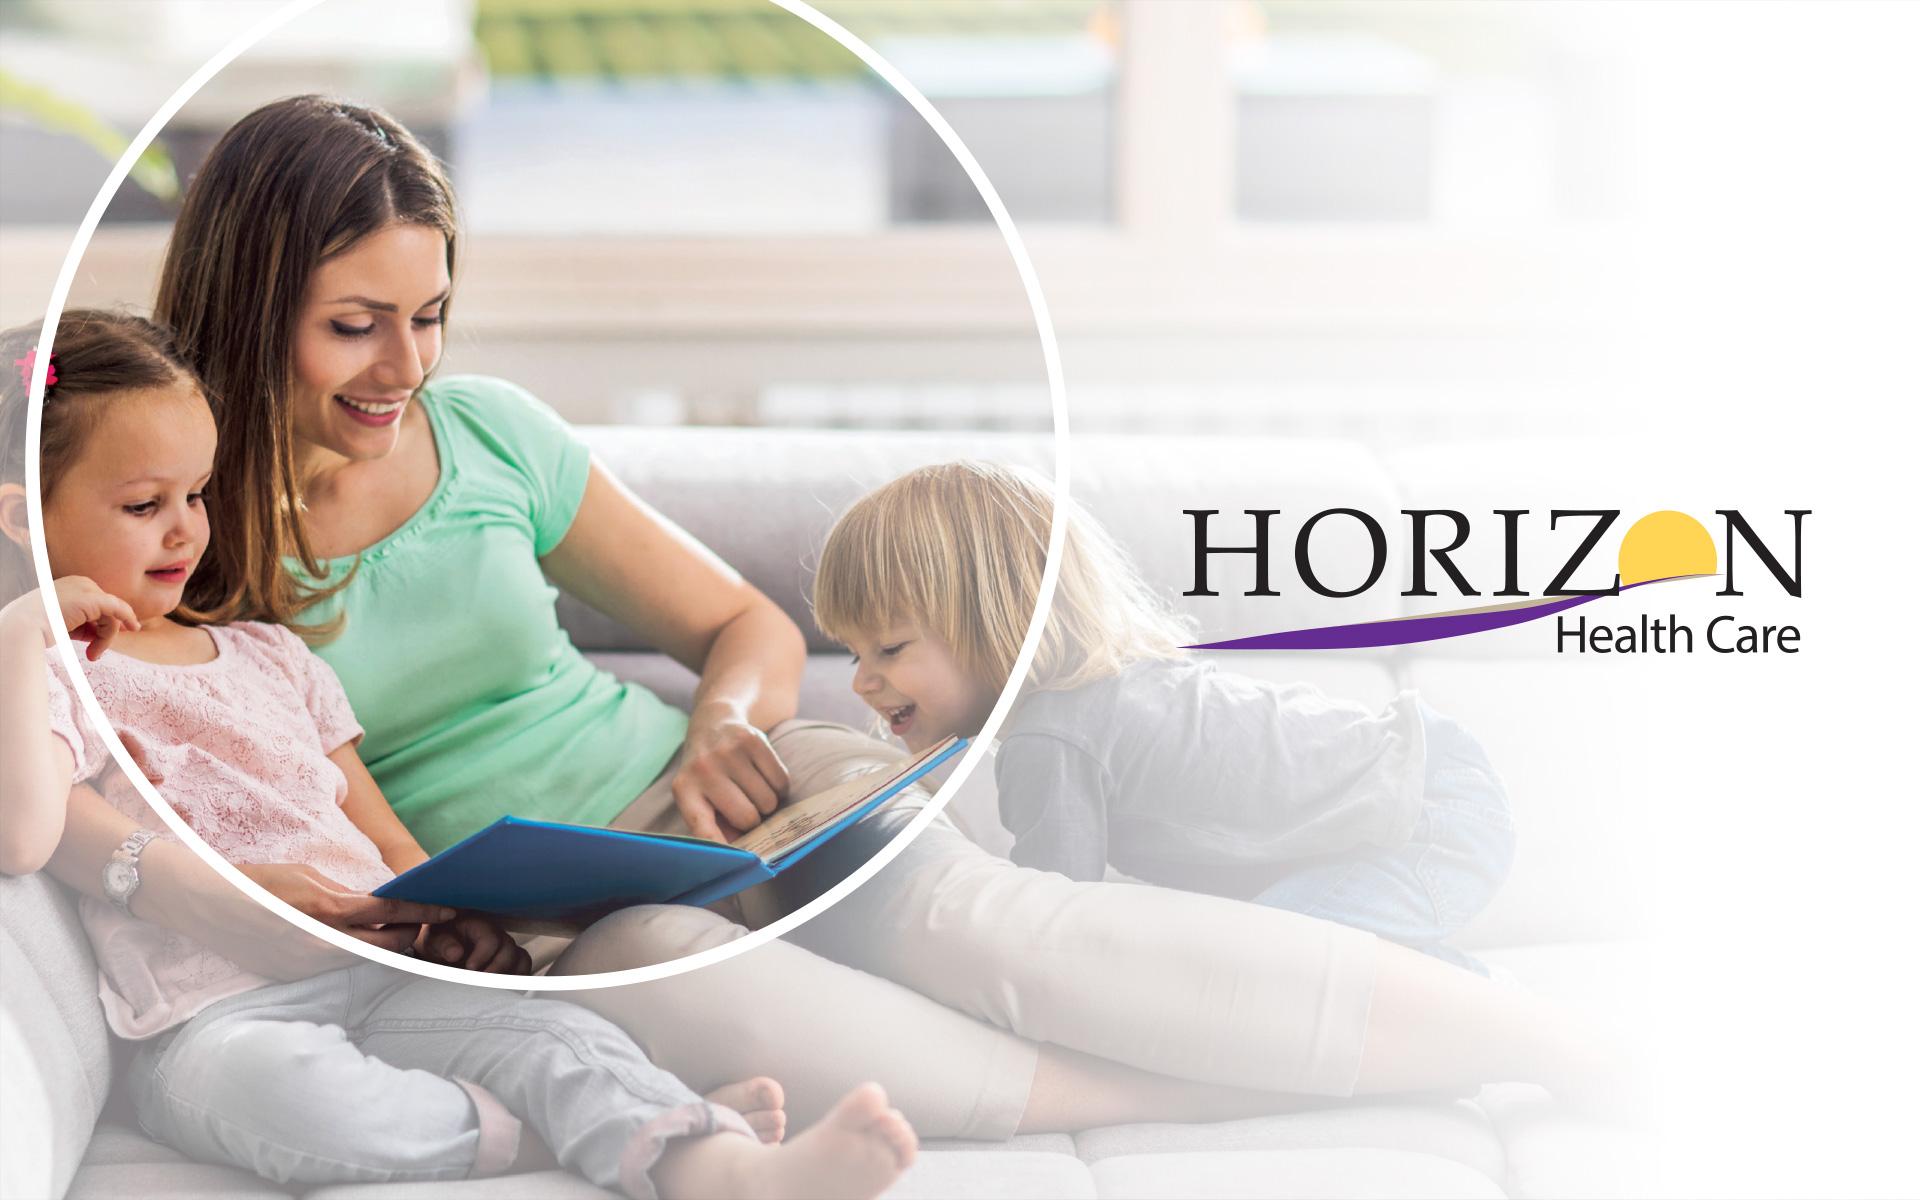 Horizon Health Care